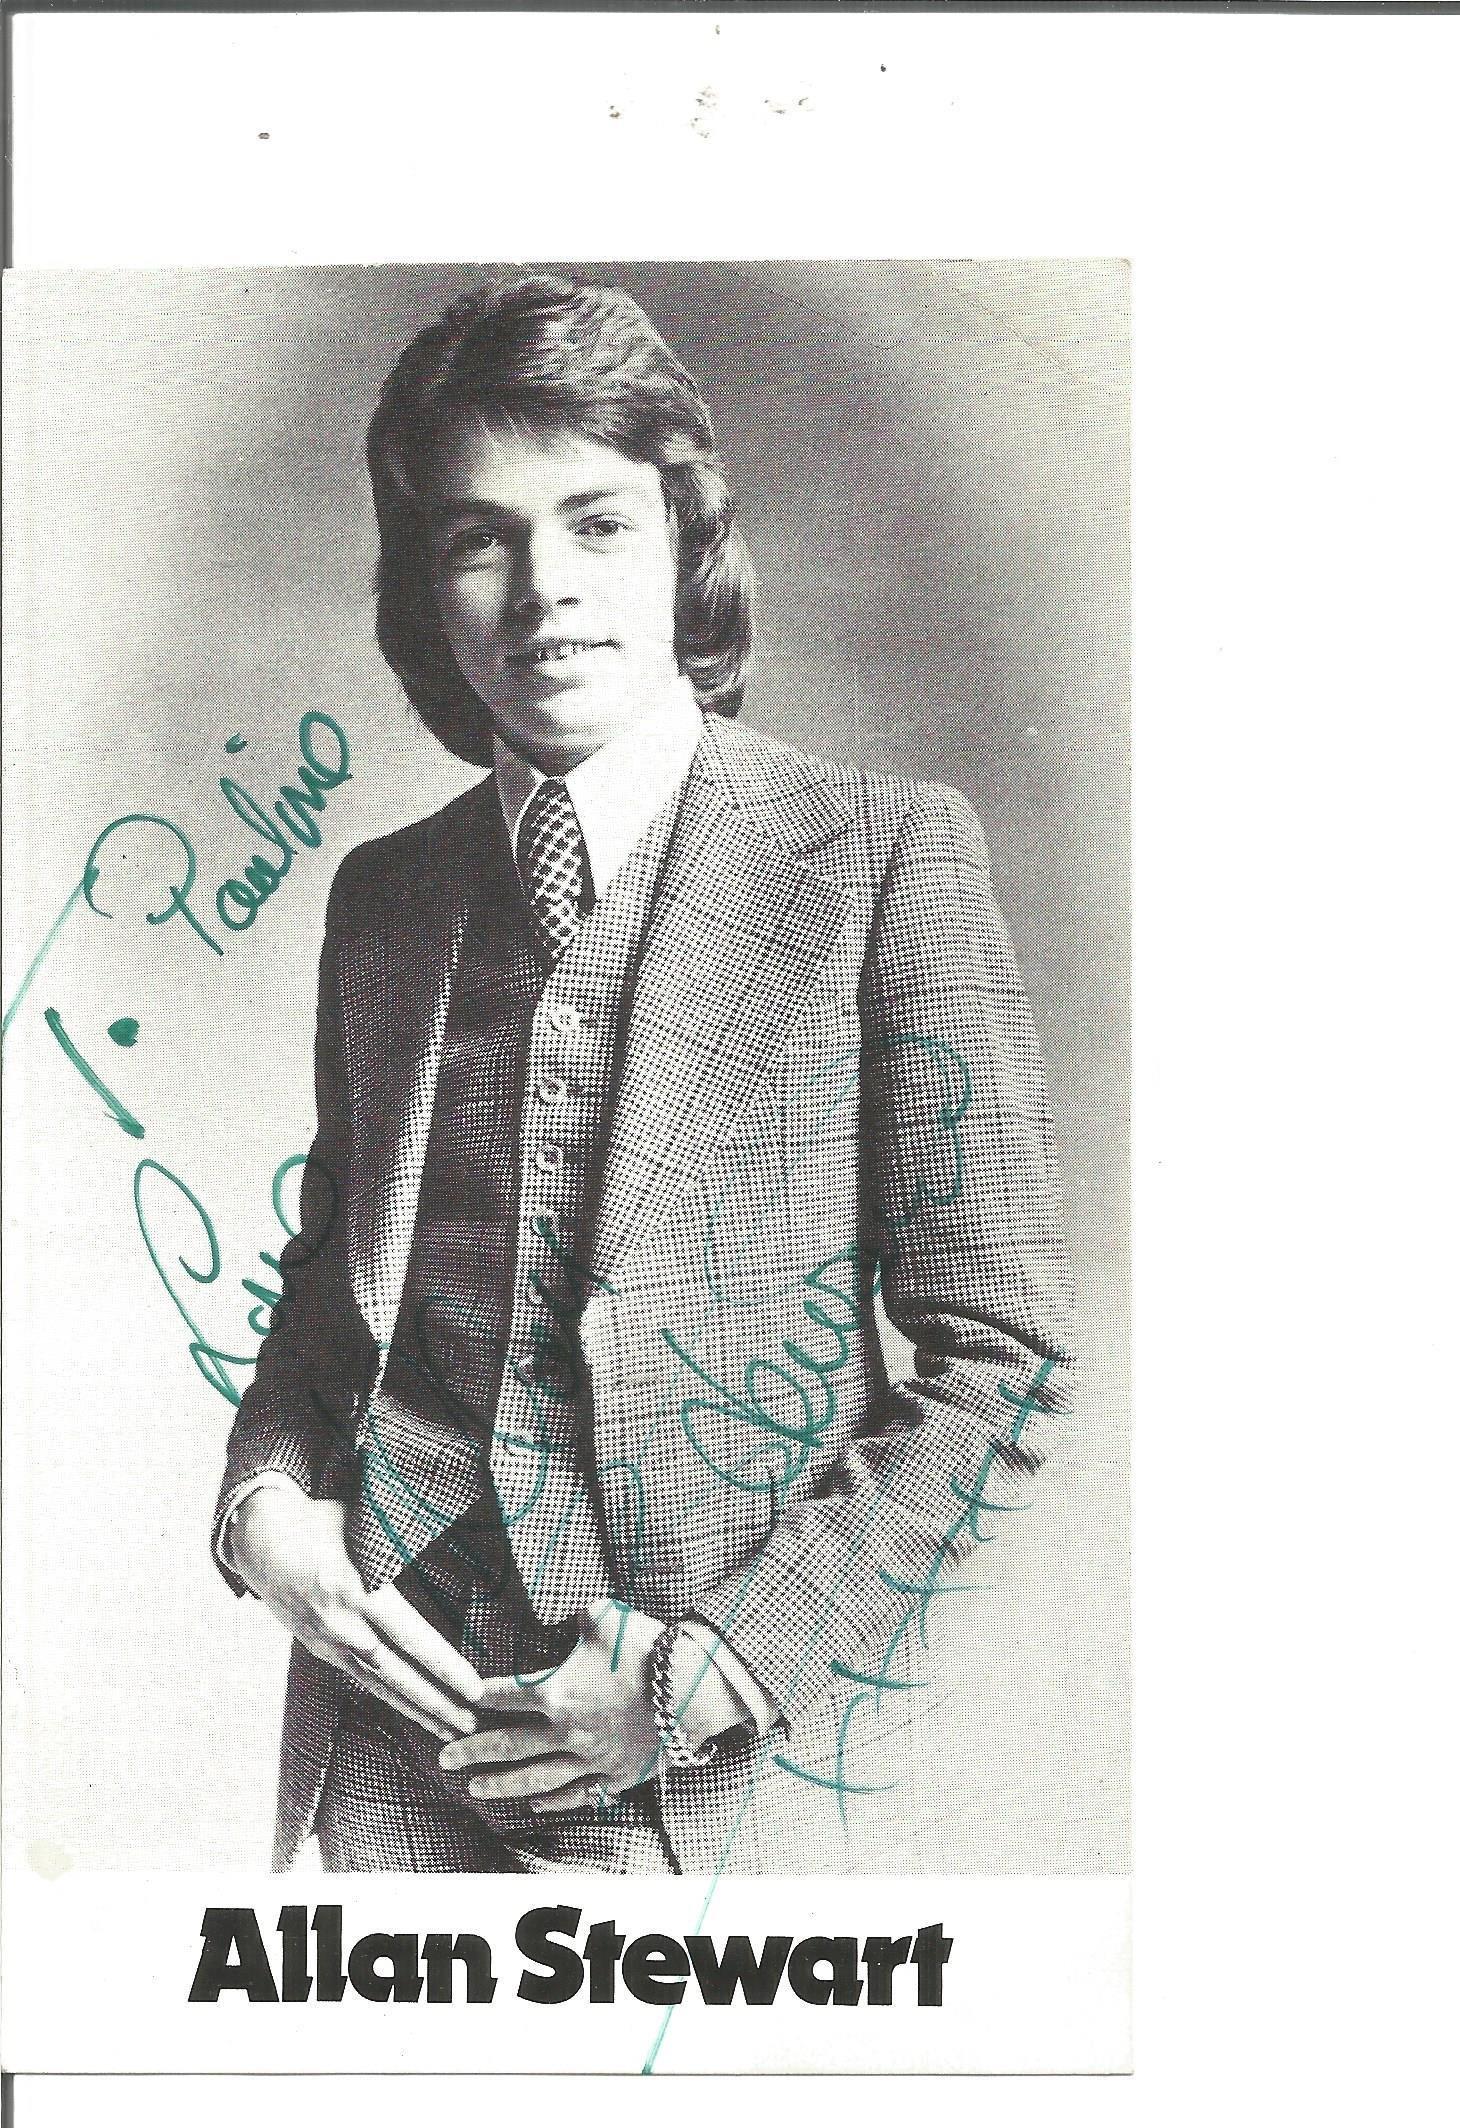 Allan Stewart signed 6x4 black and white photo.